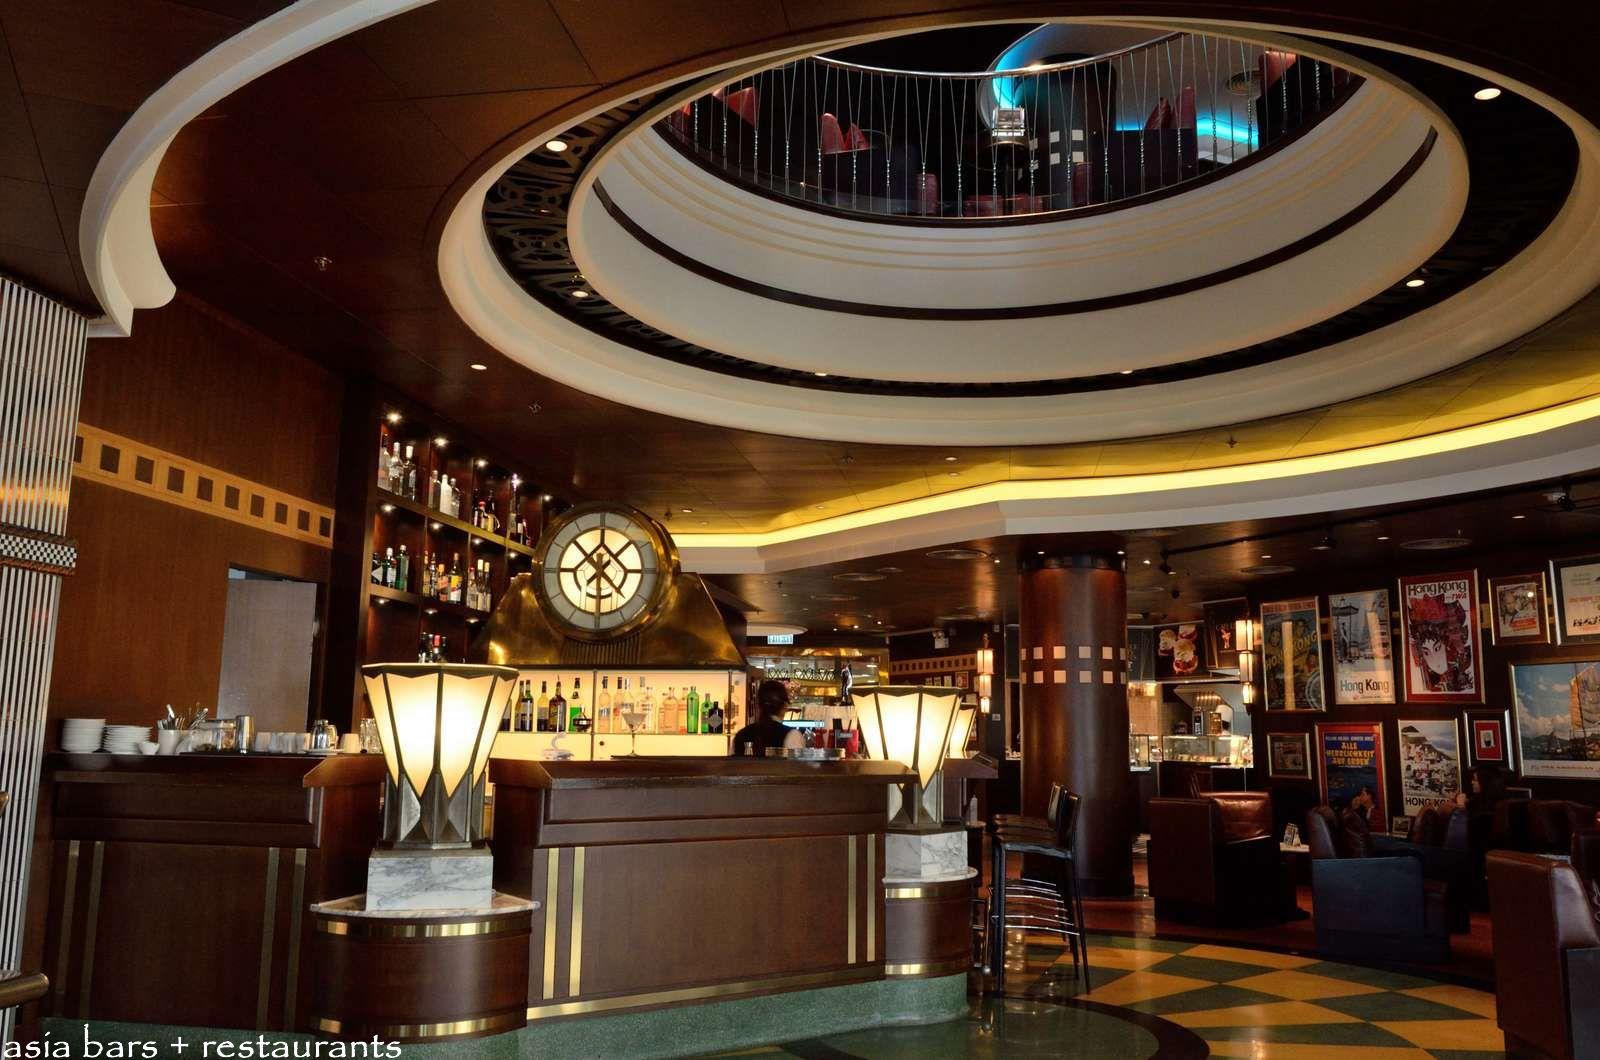 Cafe deco bar grill at the peak hong kong asia bars restaurants - Club deco ...